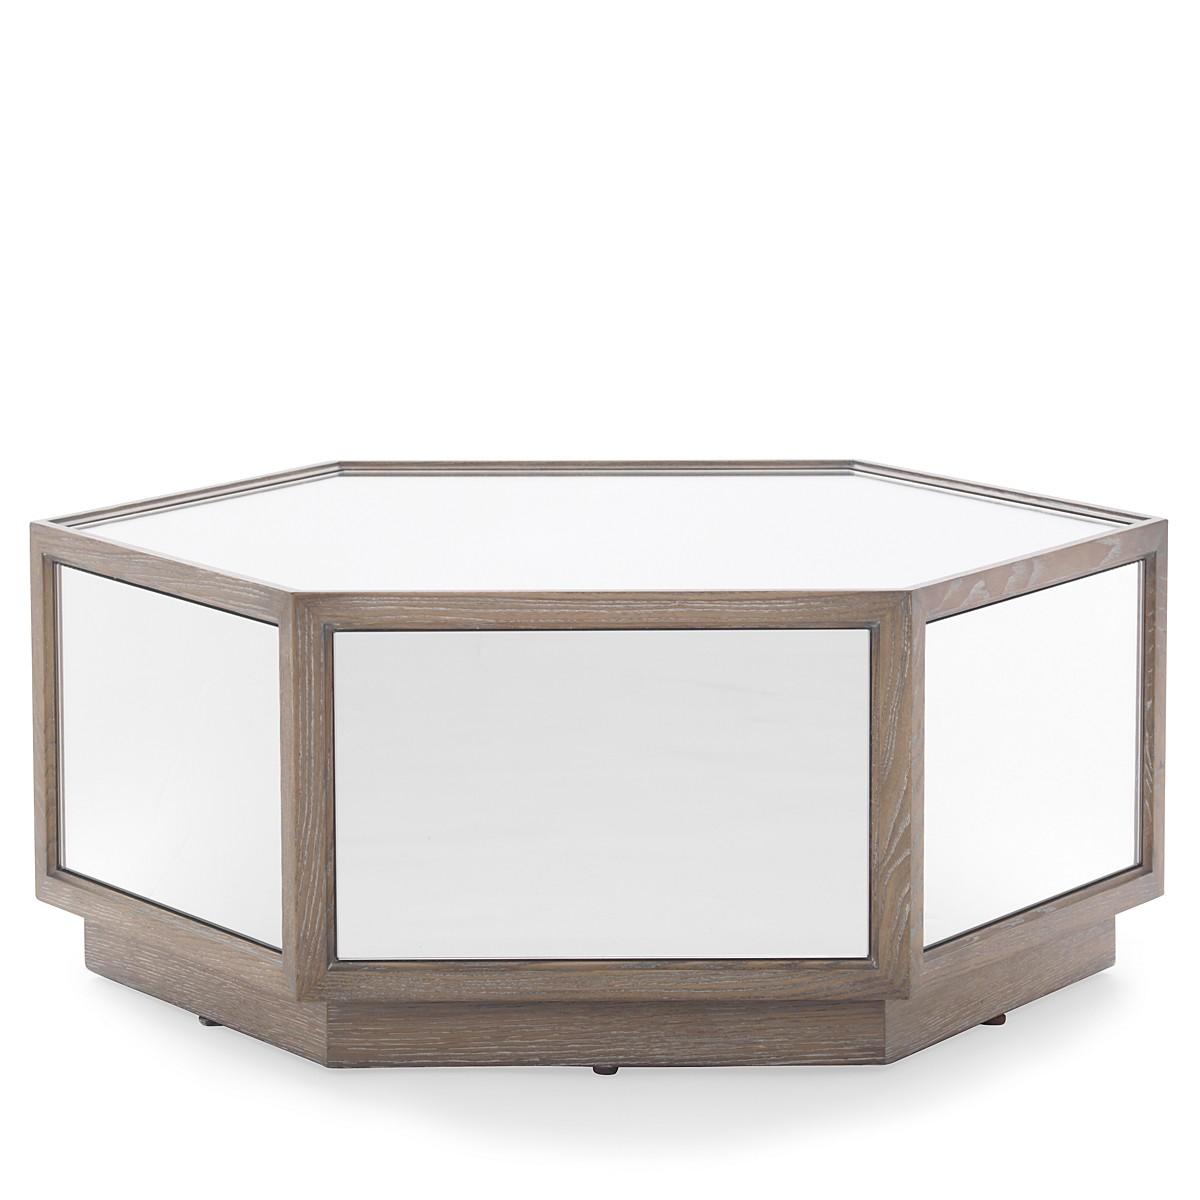 Aidan Gray Sofa Table Bunk Bed With On Bottom Darya Girina Interior Design Industrial Loft Diesel And